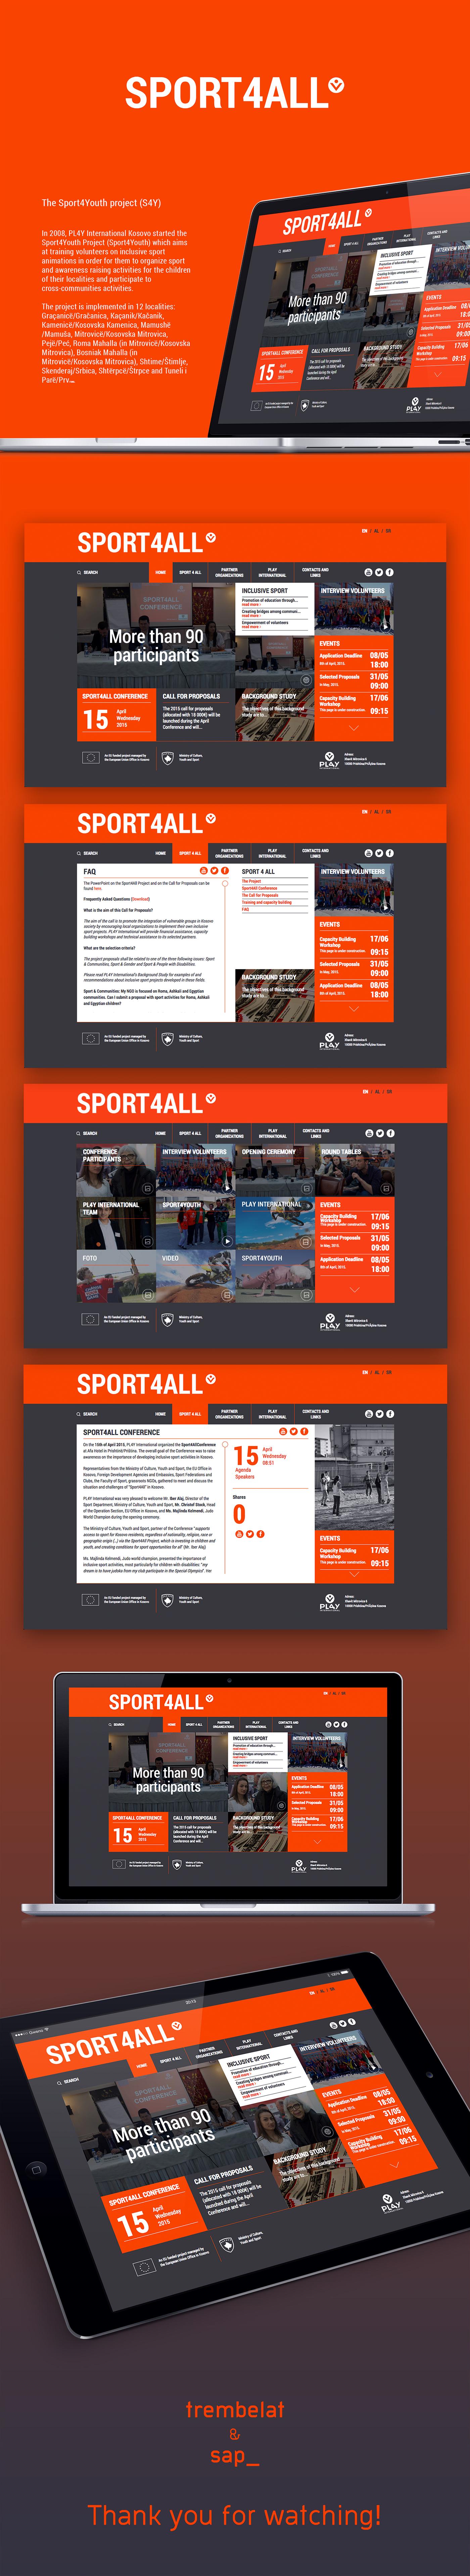 Web online sport all sport4all Webdesign design youth orange black minimal